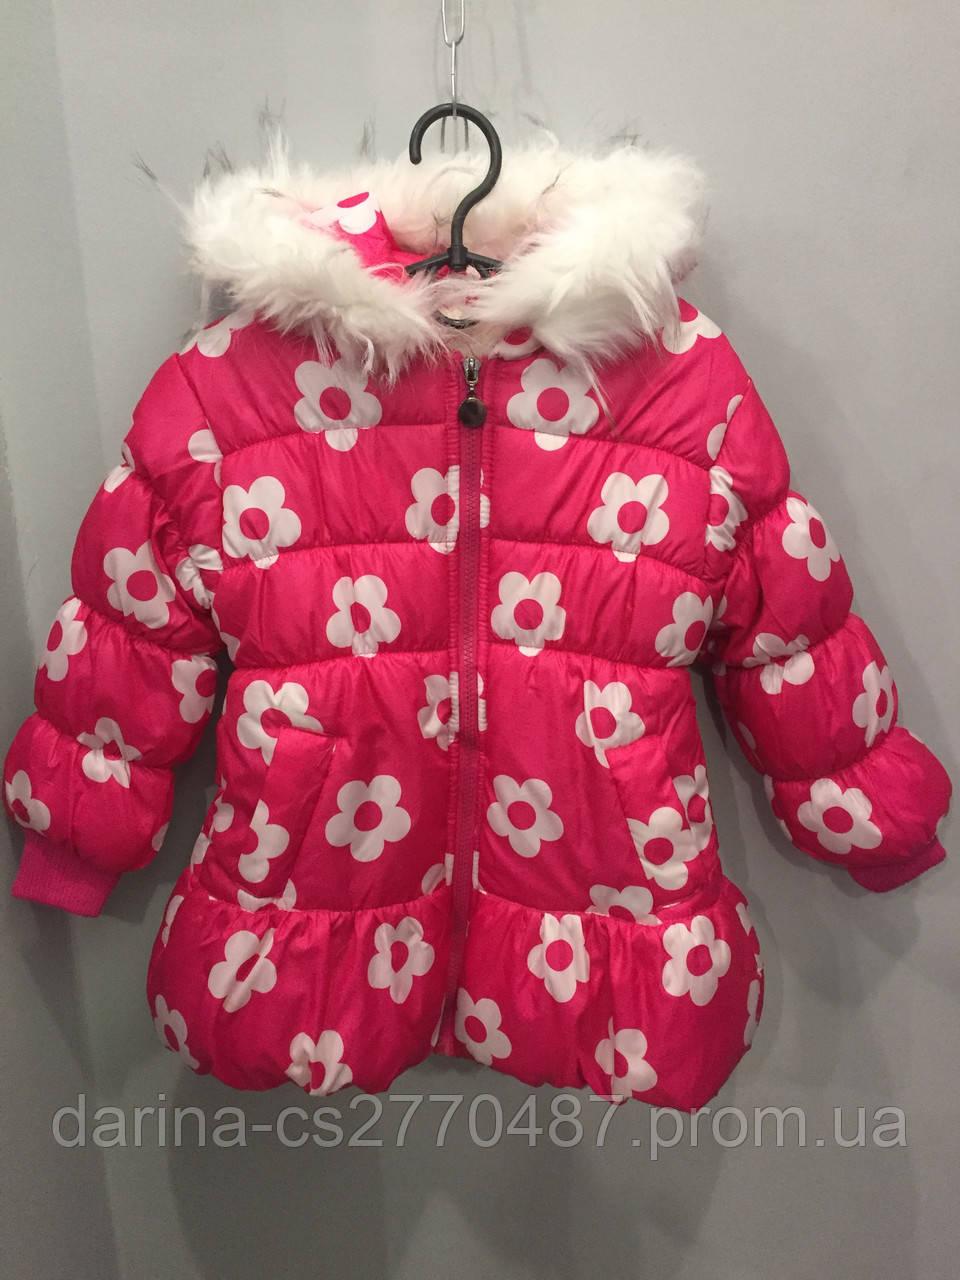 Зимняя куртка для девочки цветами 4-5 л, фото 1